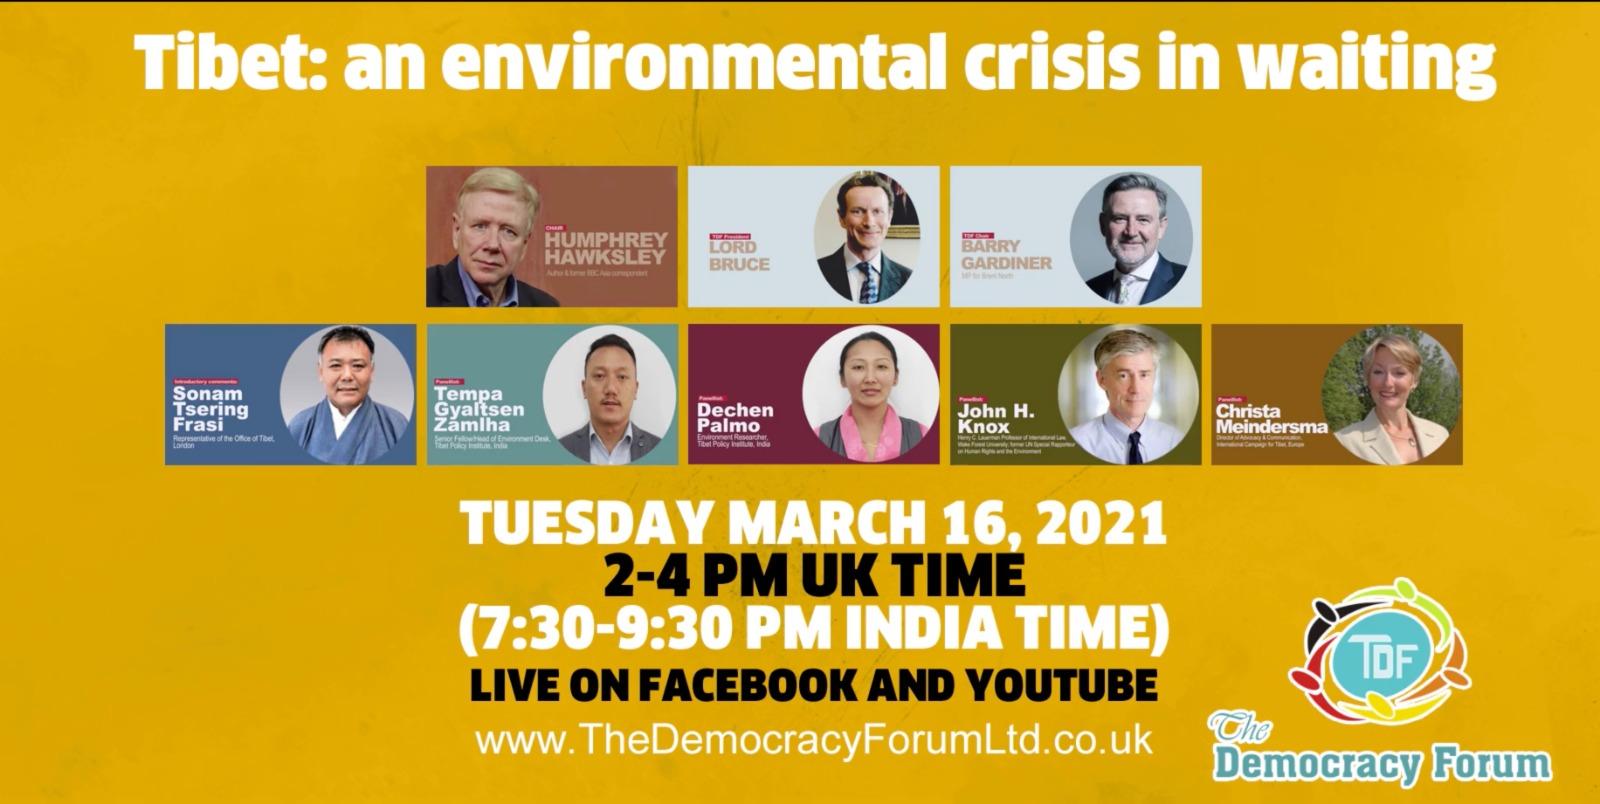 Tibet: an environmental crisis in waiting